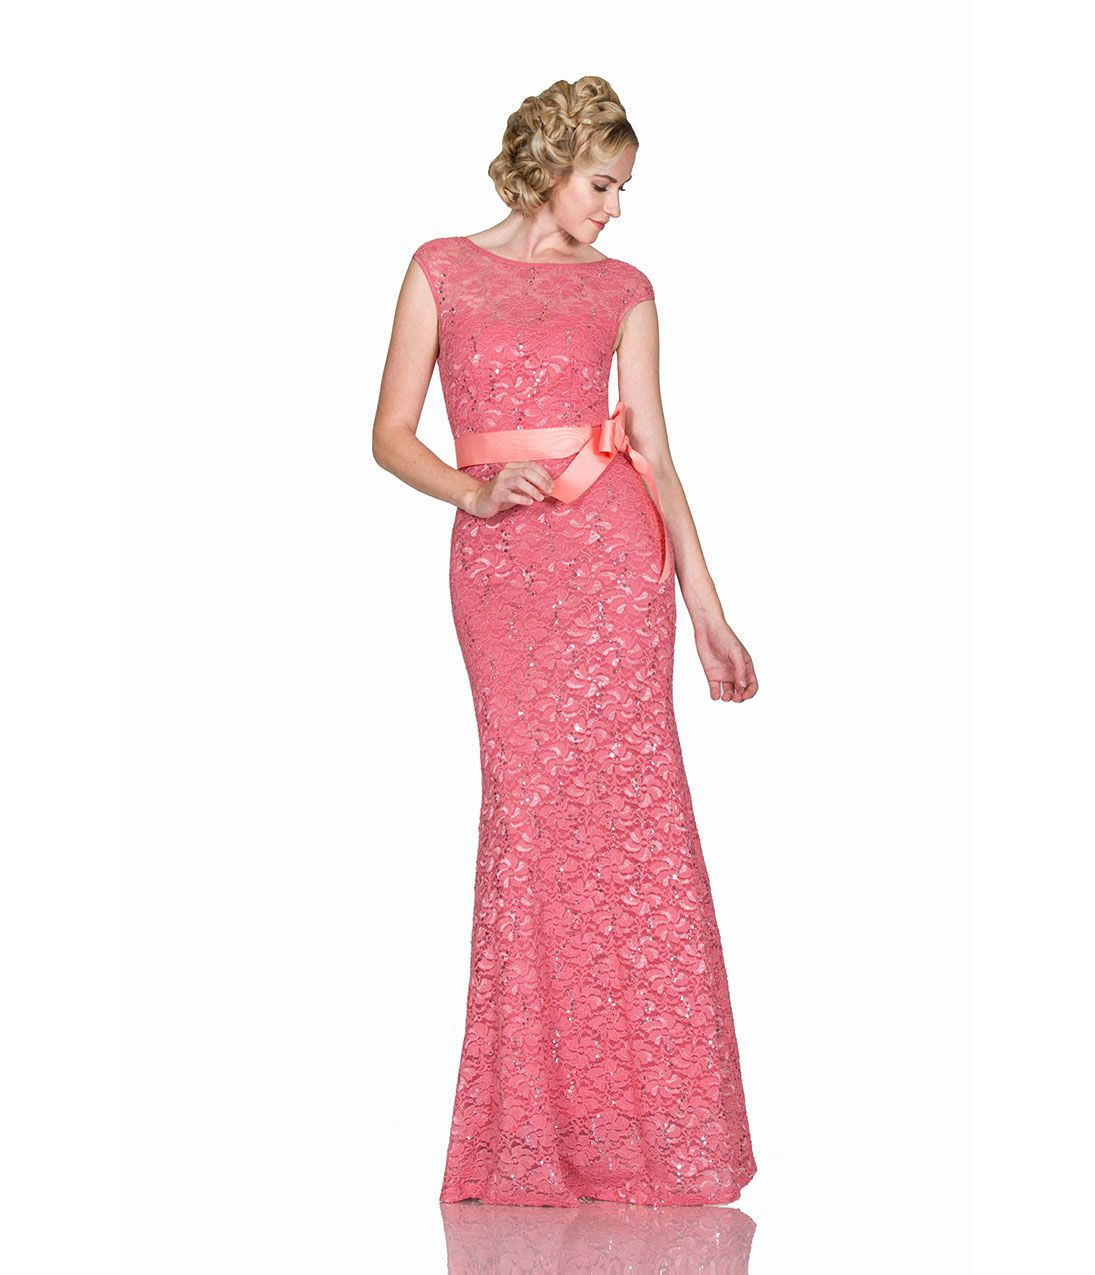 Vestidos baratos aliexpress evening color dress pinterest